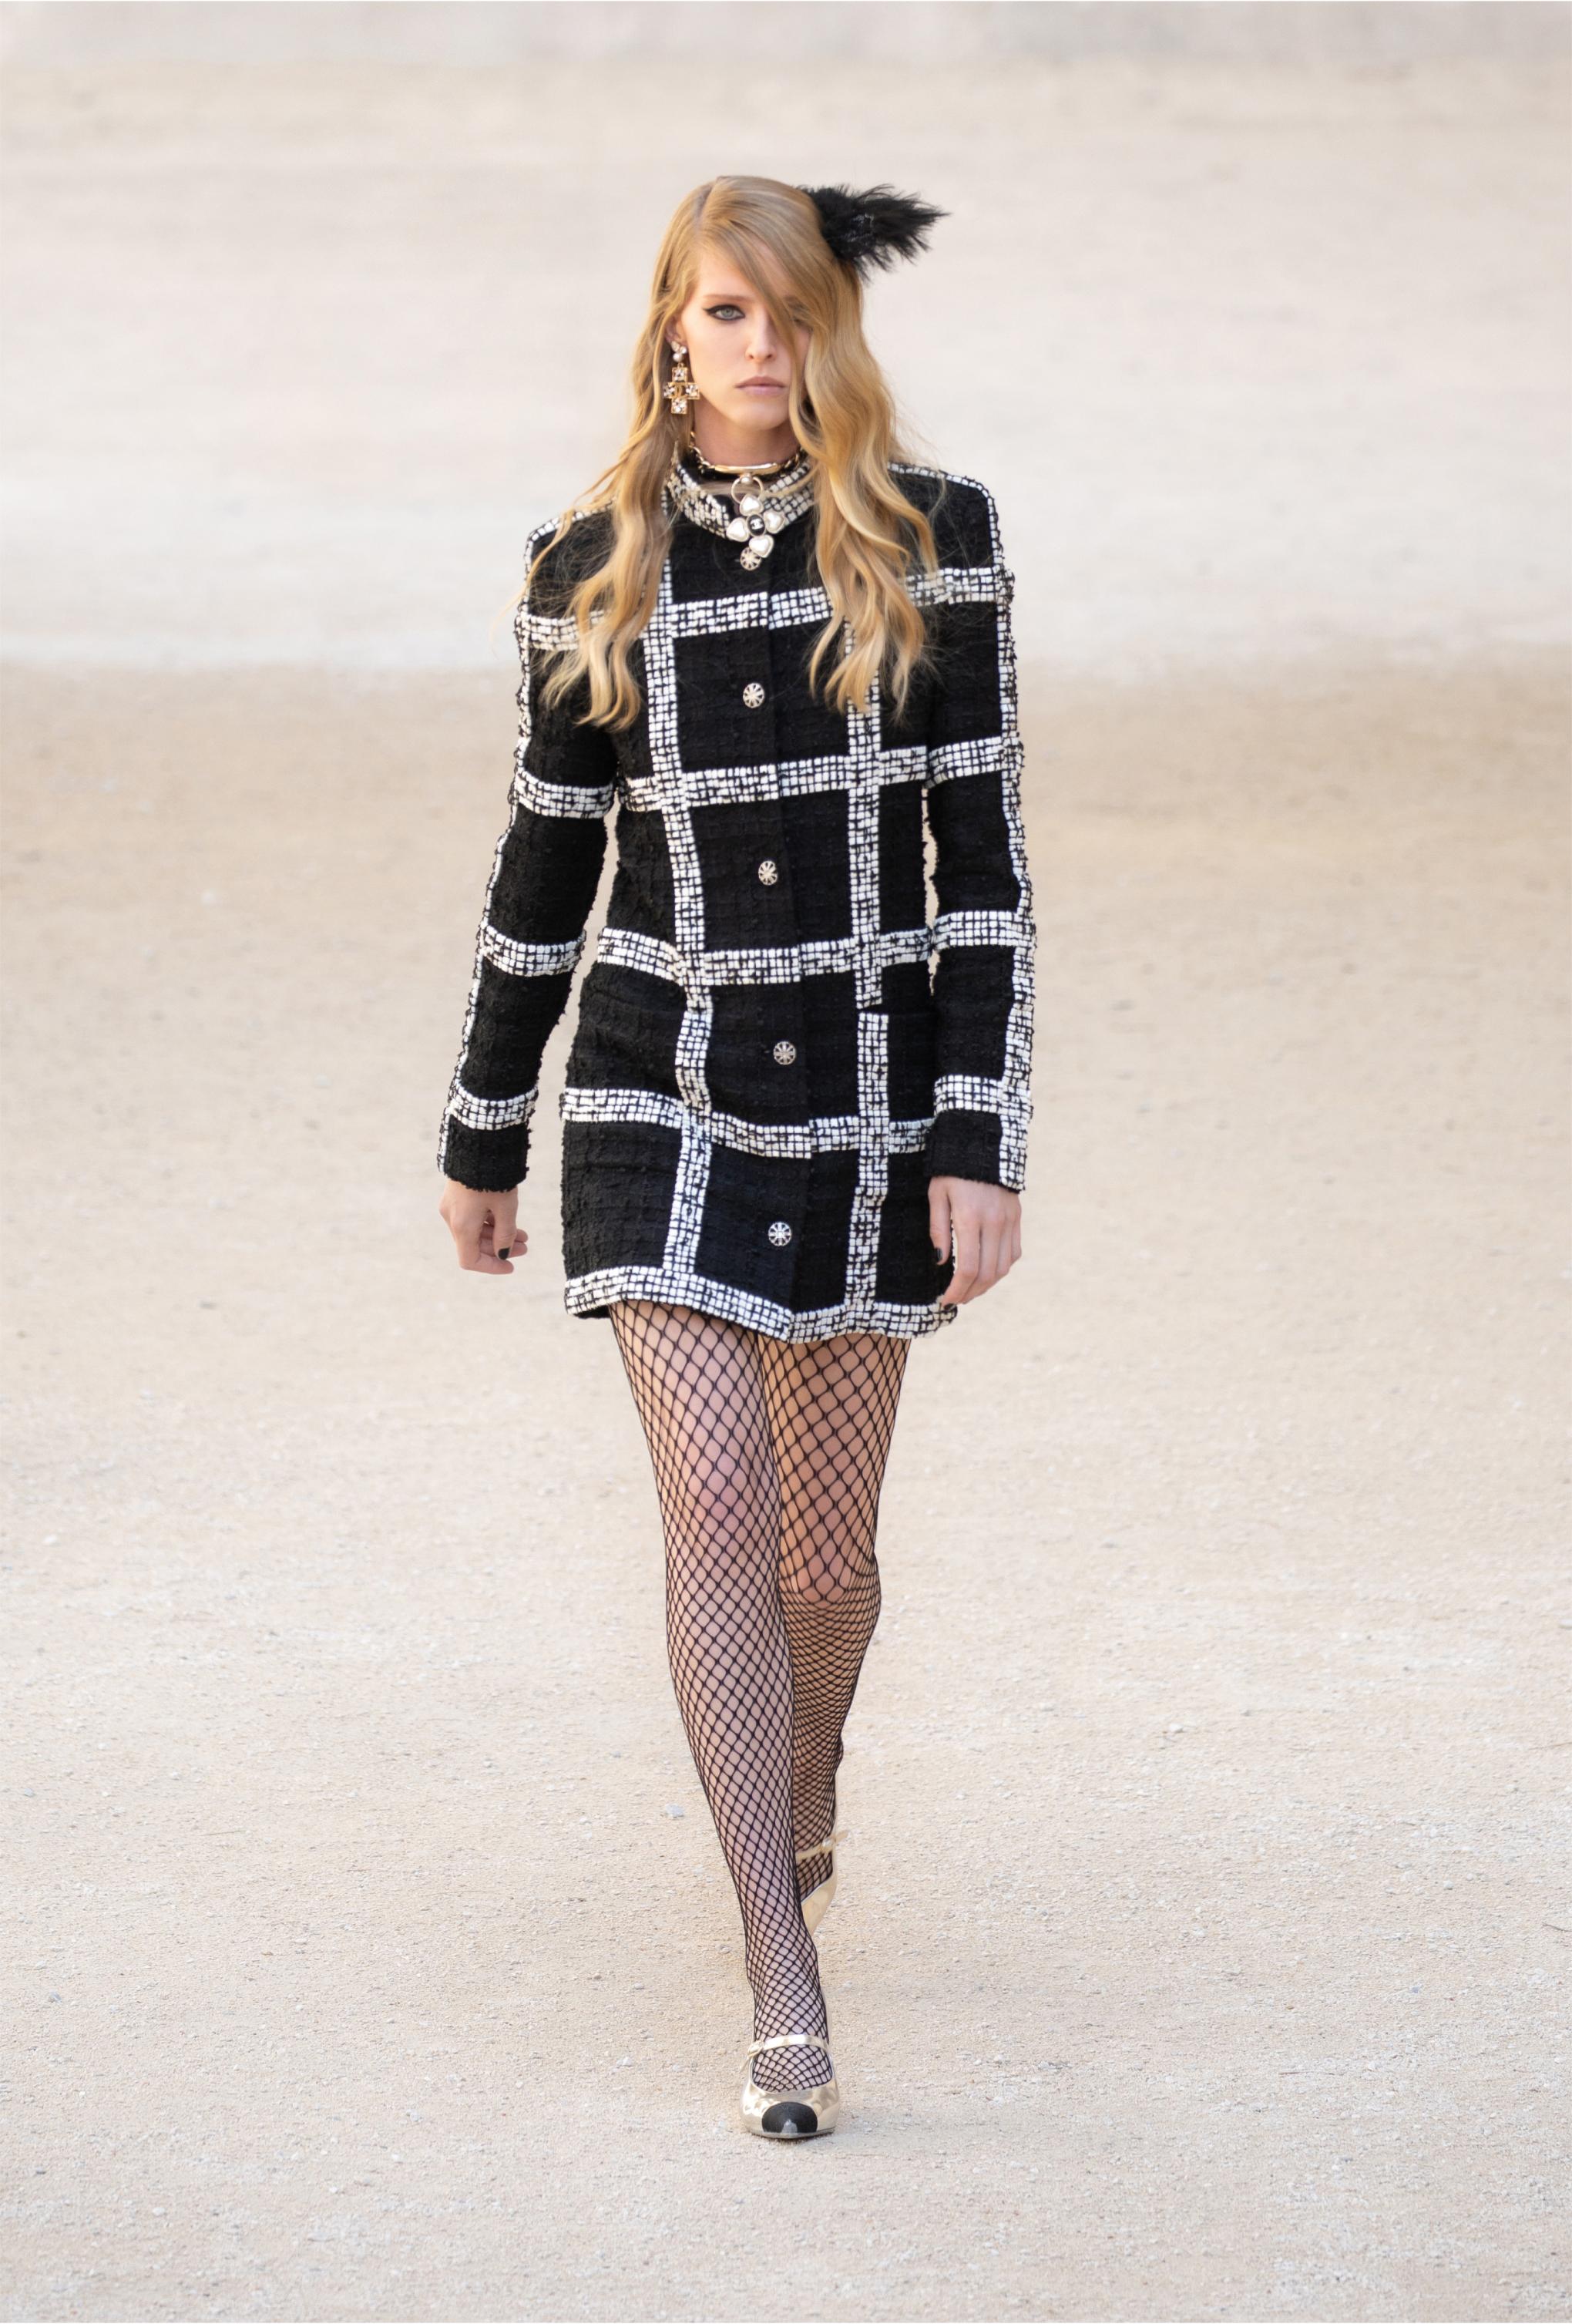 chanel 2021/22 Cruiserunway fashion show Virginie Viard